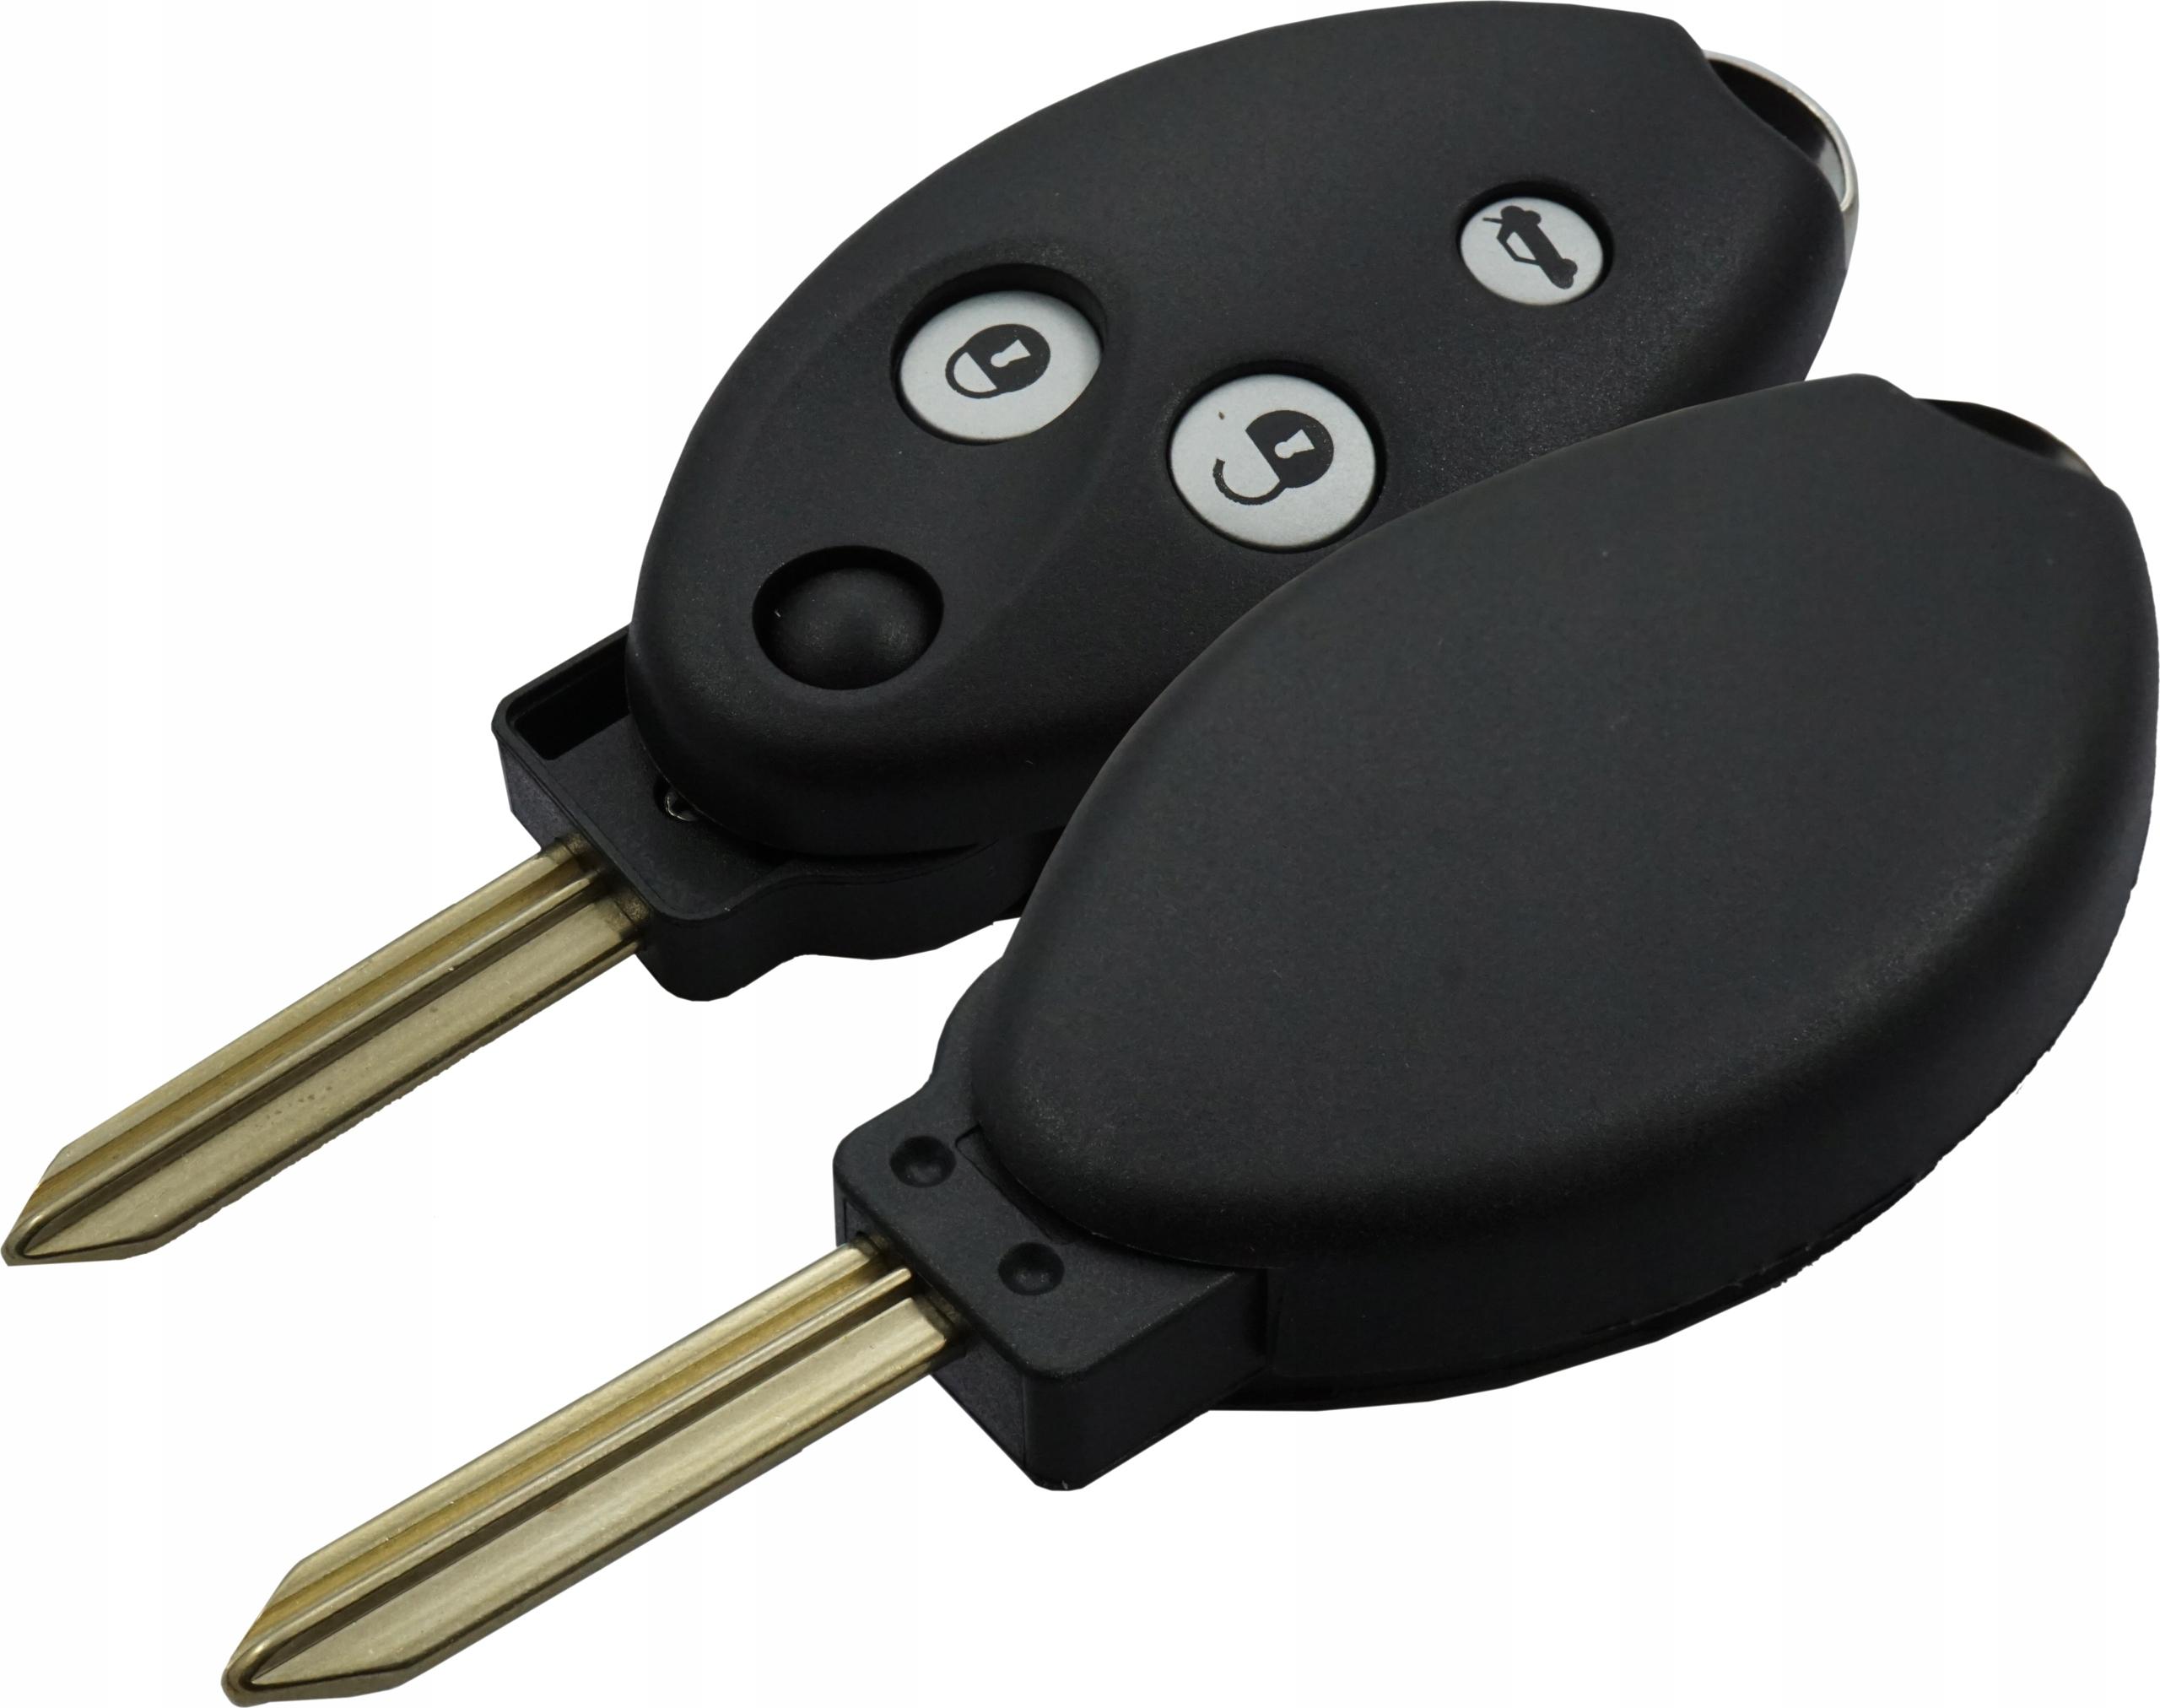 citroen c5 xsara пикассо корпус ключа пульт